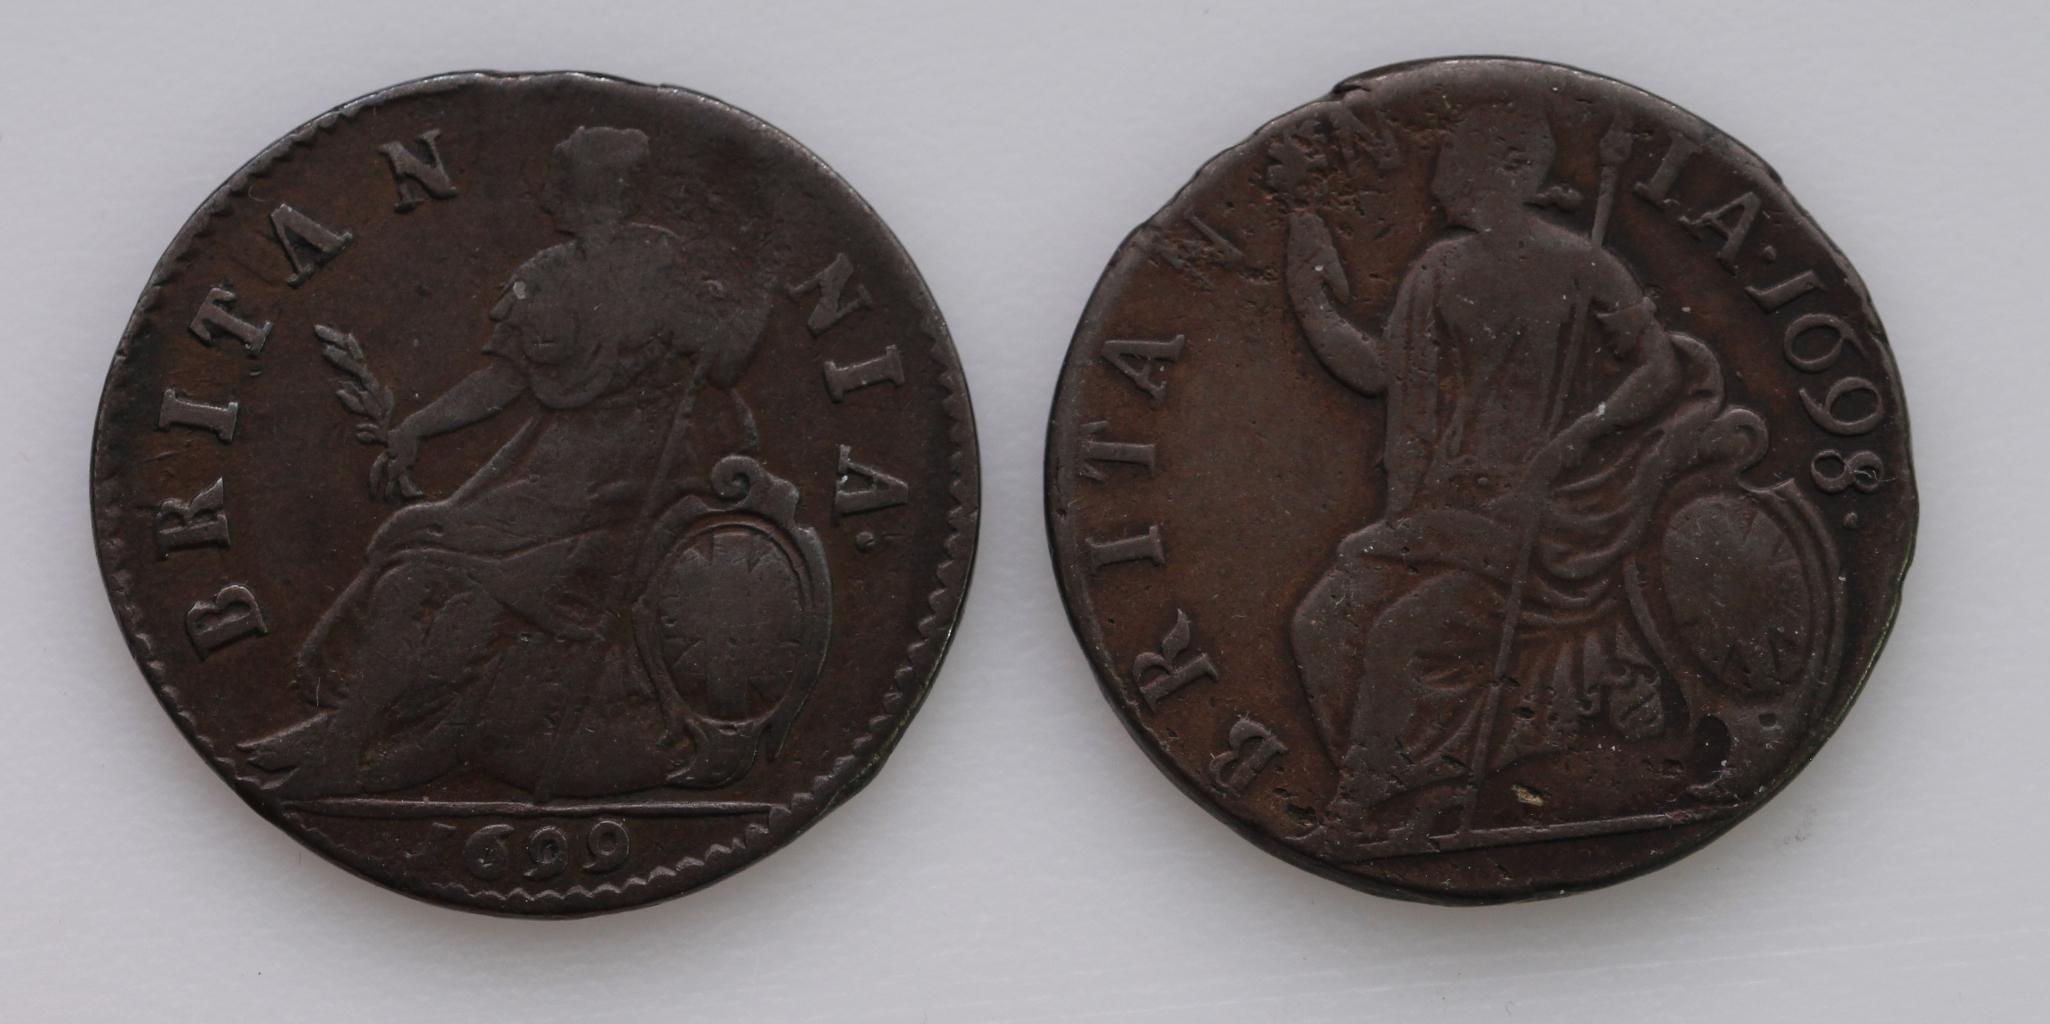 Halfpennies (2) William III: 1698 date in legend, nF, and 1699 date in exergue, Fine. - Image 2 of 2